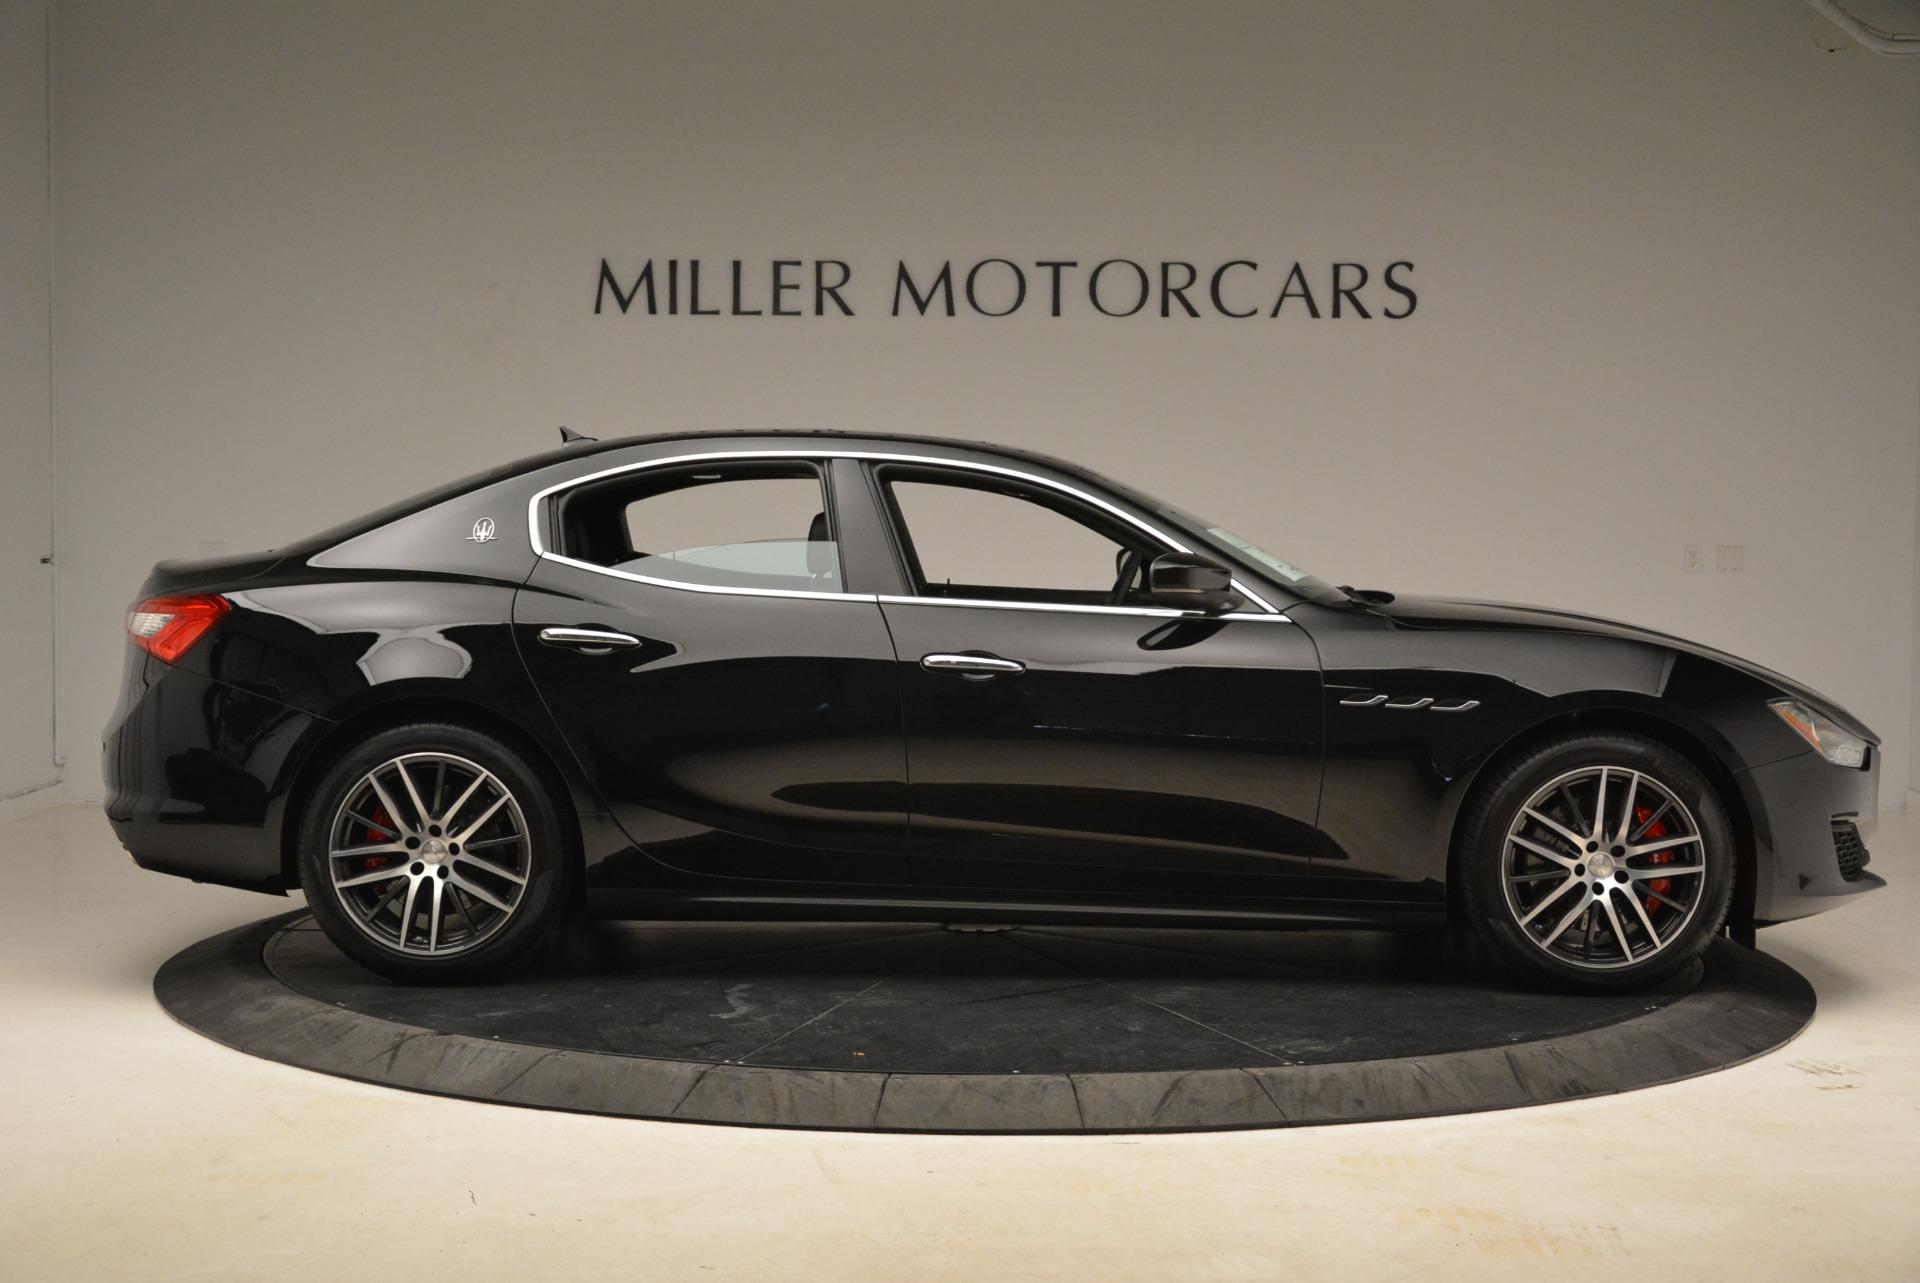 Used 2018 Maserati Ghibli S Q4 For Sale In Greenwich, CT. Alfa Romeo of Greenwich, M2143 2271_p10